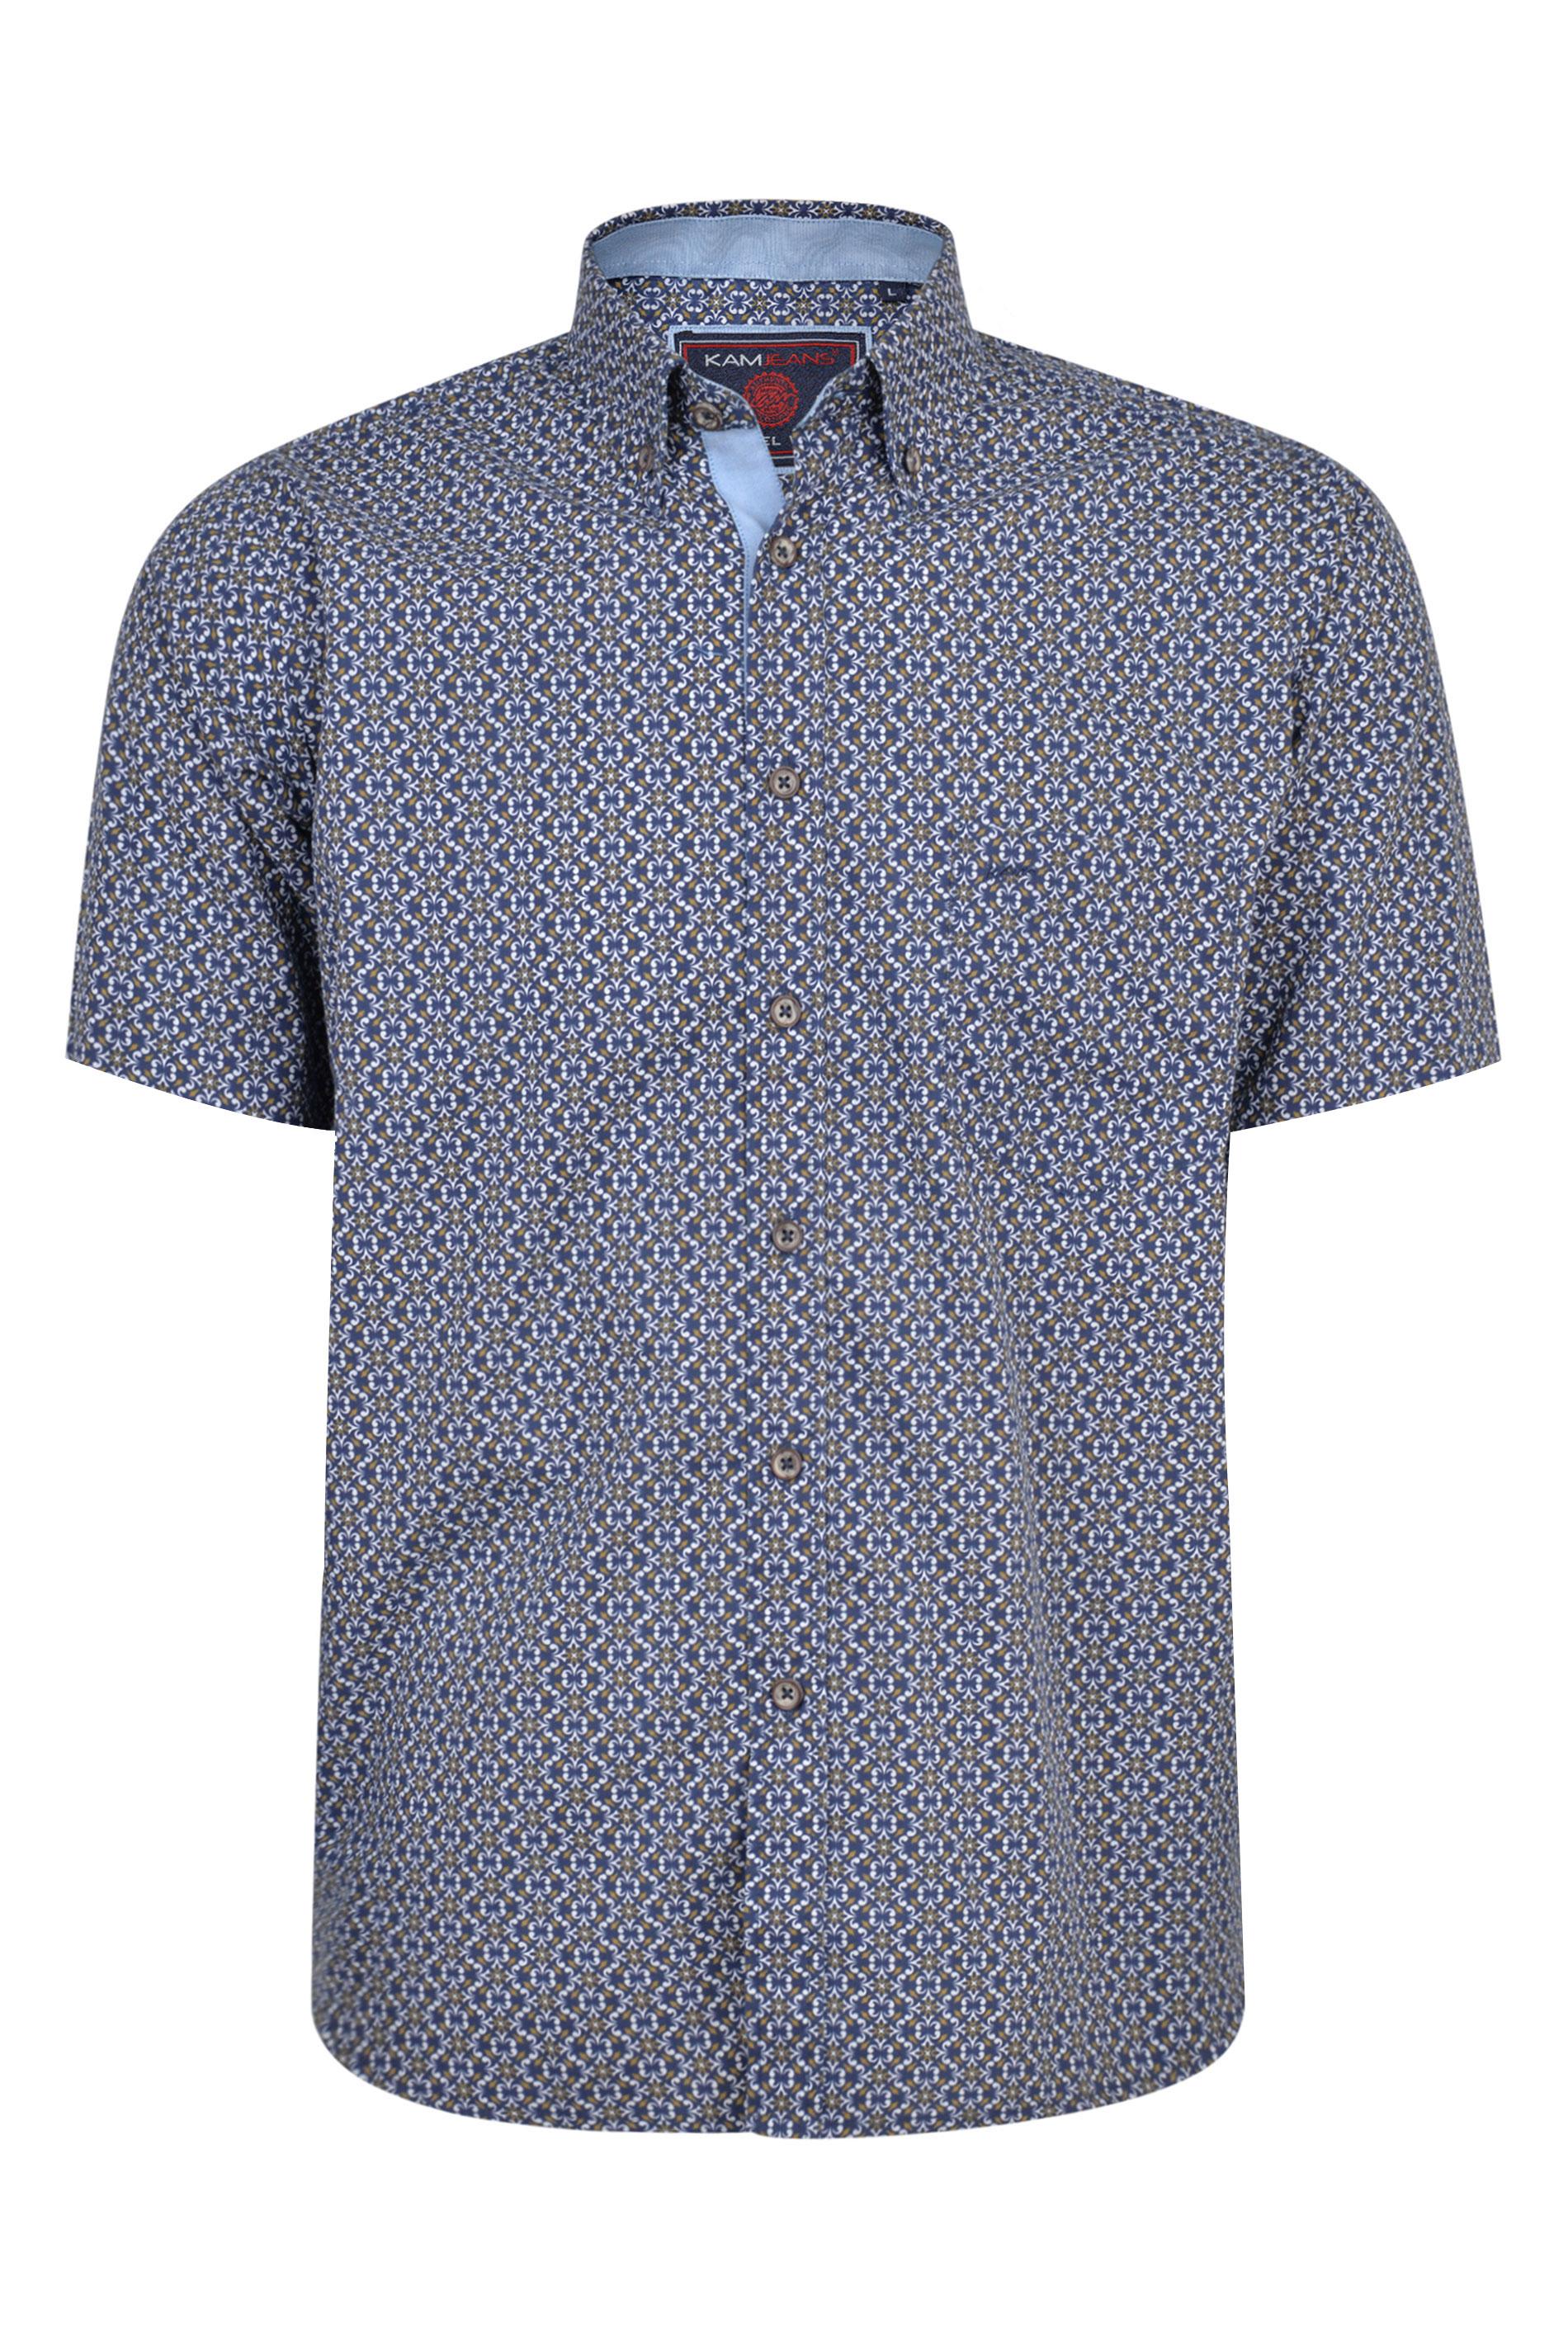 KAM Navy Paisley Short Sleeve Cotton Shirt